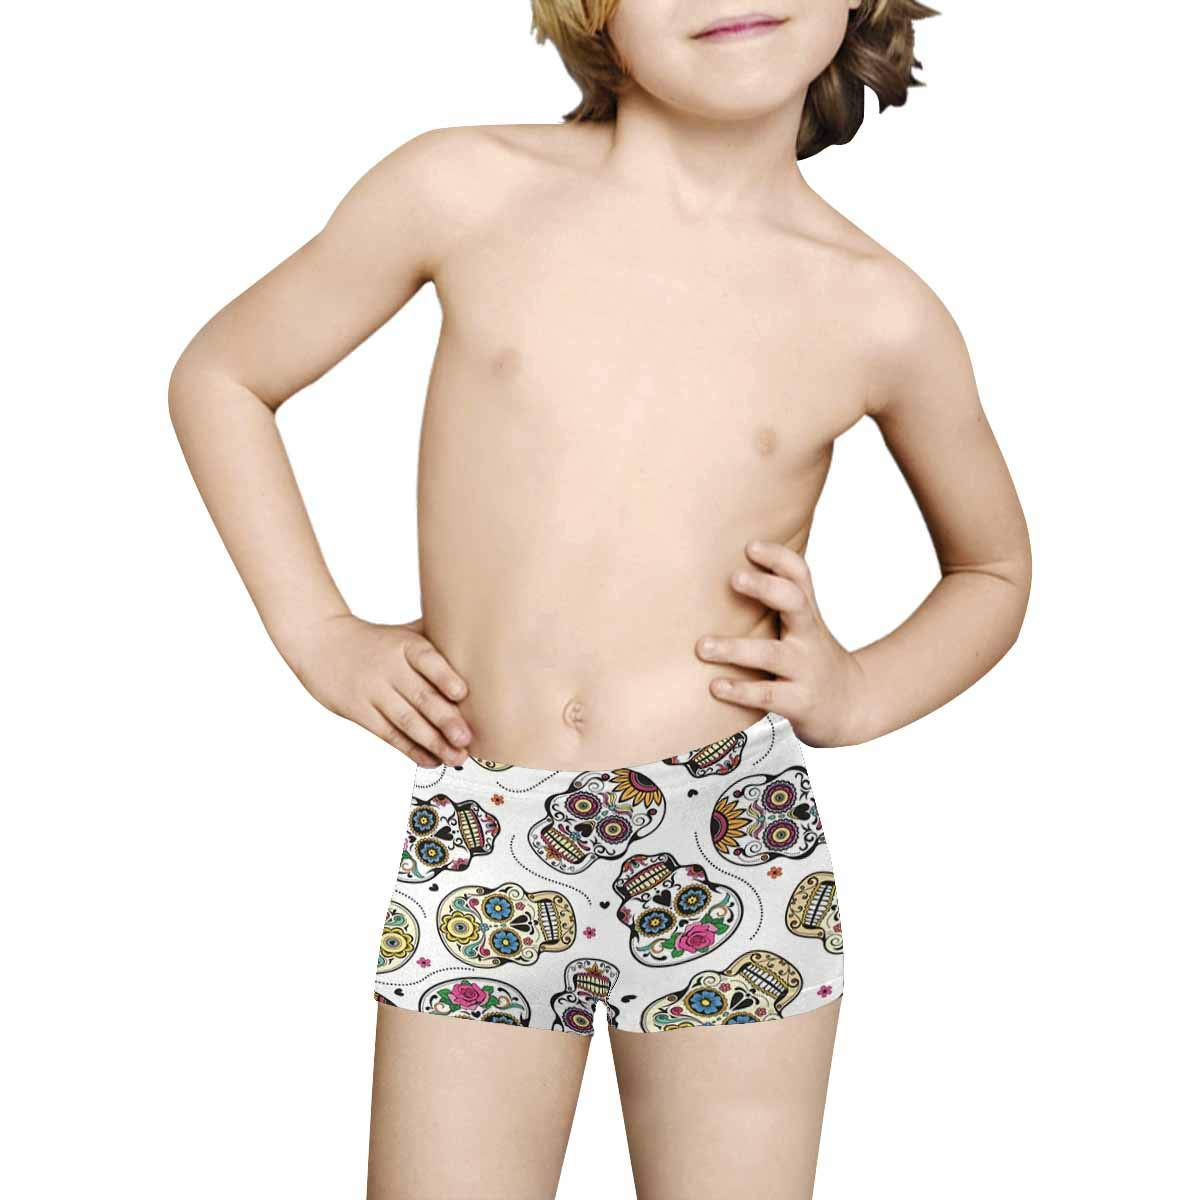 INTERESTPRINT Kids Beautiful Sugar Skulls Comfortable Breathable Briefs 5T-2XL